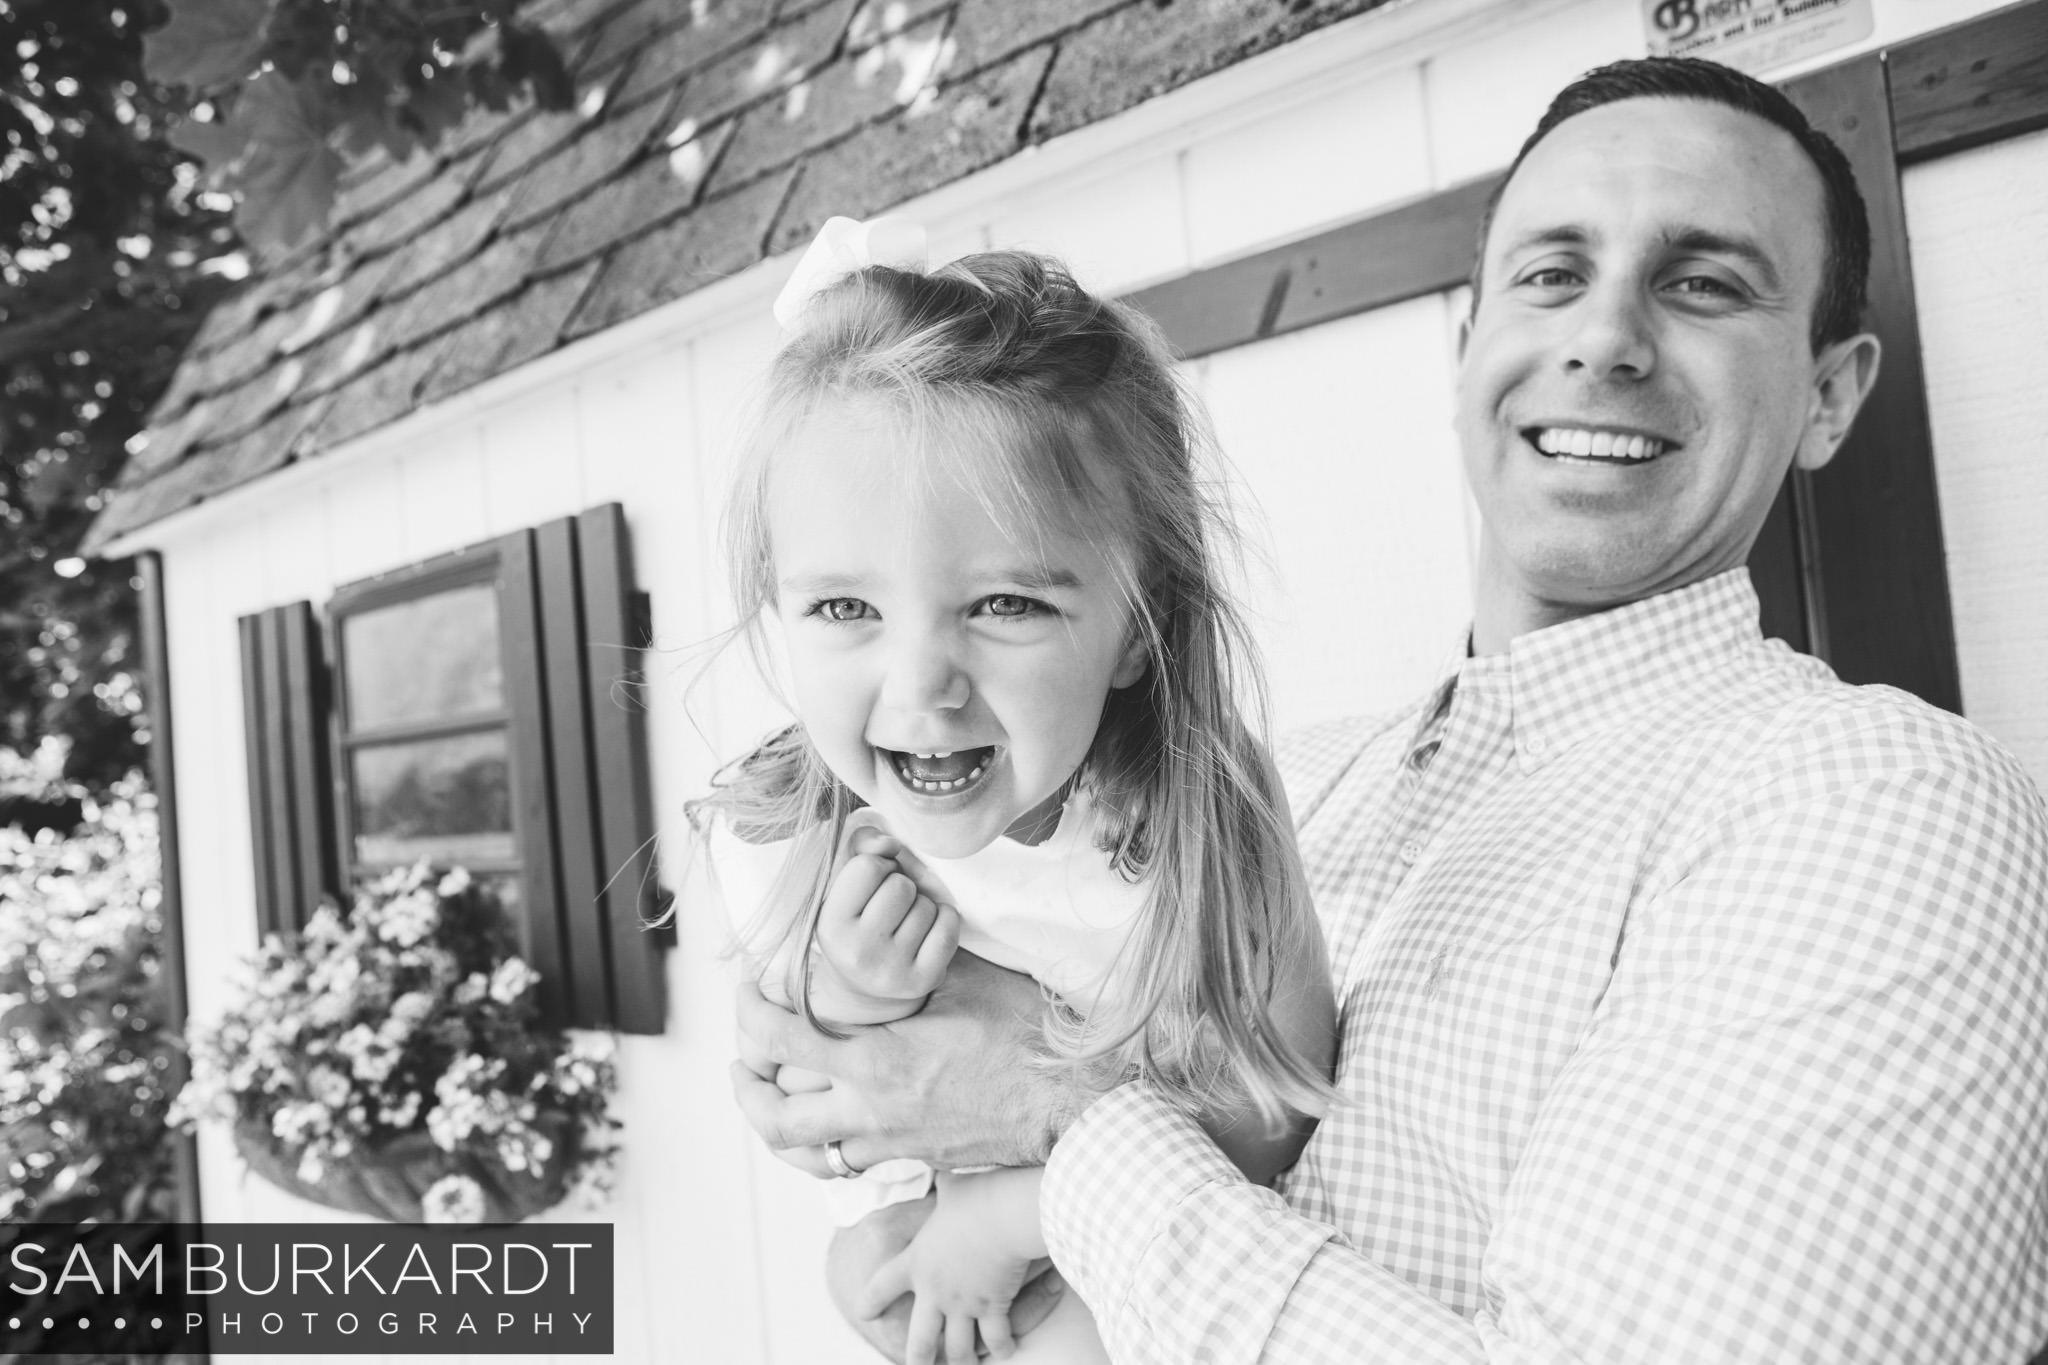 sburkardt_family_portraits_photoshoot_ridgefield_connecticut_summer_tea_party_007.jpg